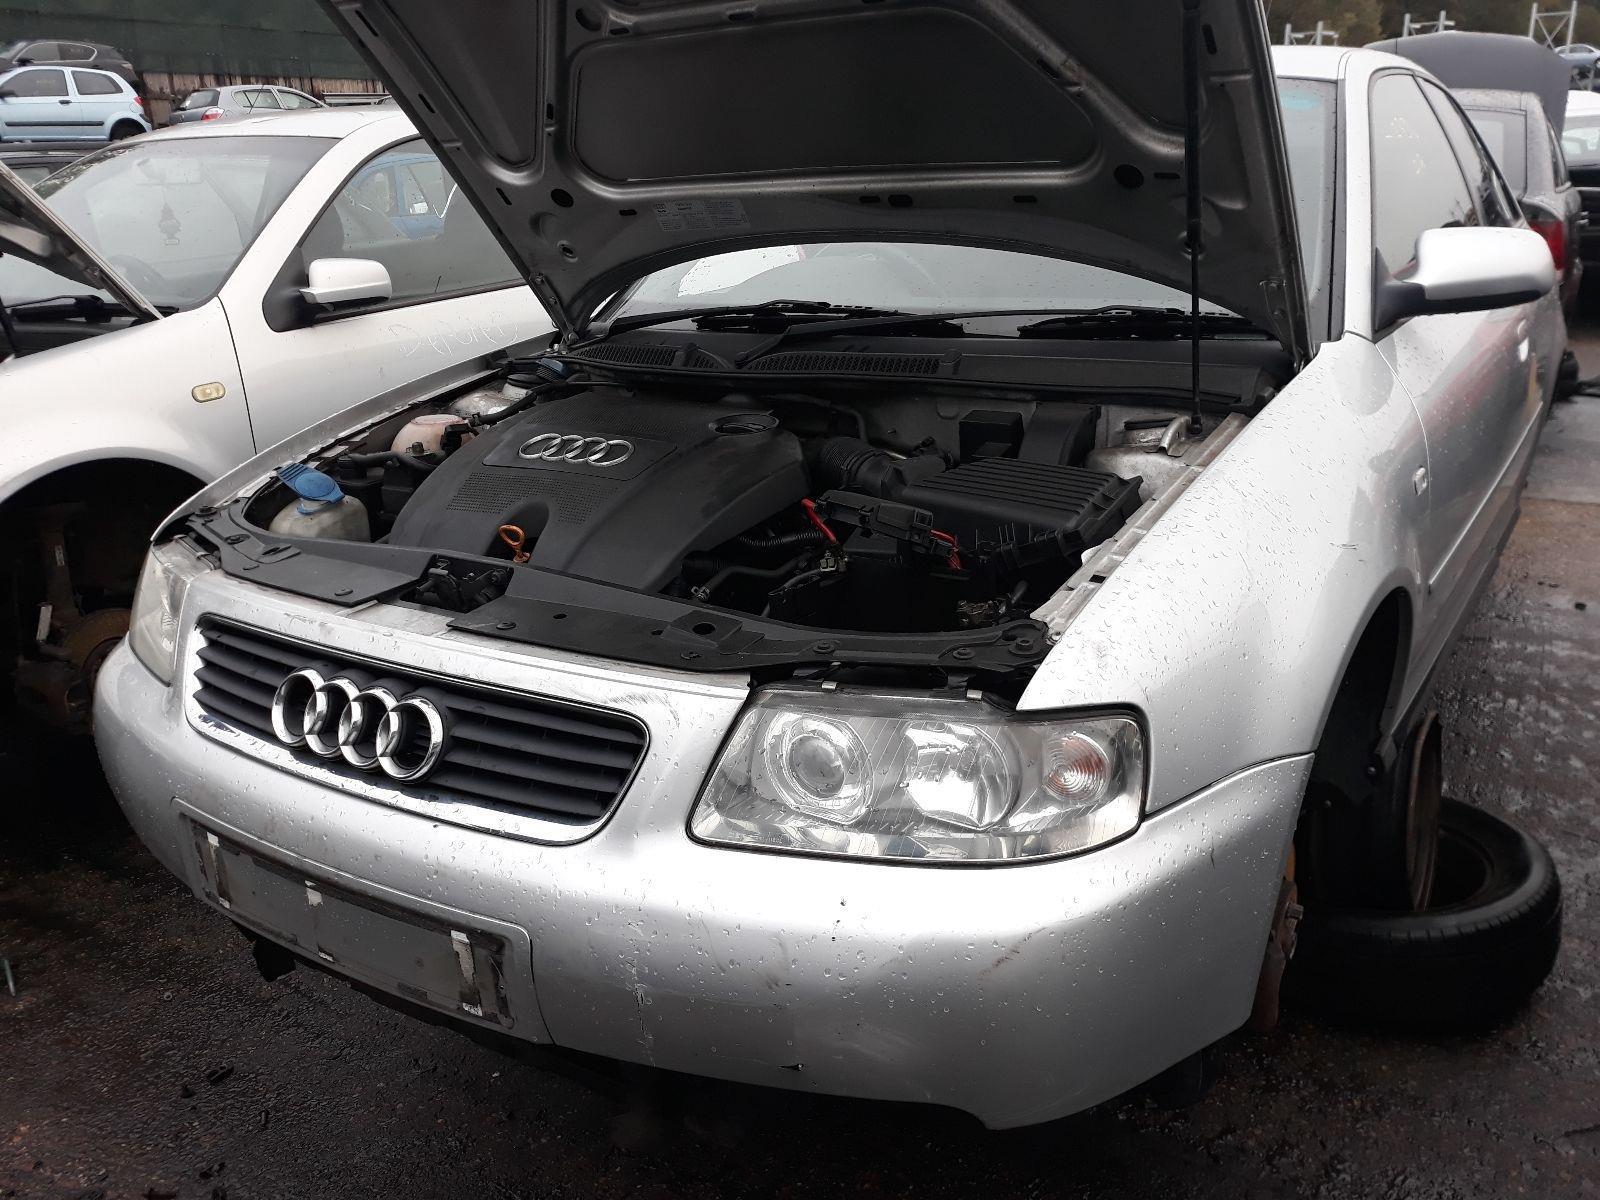 Audi A3 1996 To 2003 Sport 3 Door Hatchback Scrap Salvage Car Skoda Citigo Fuse Box